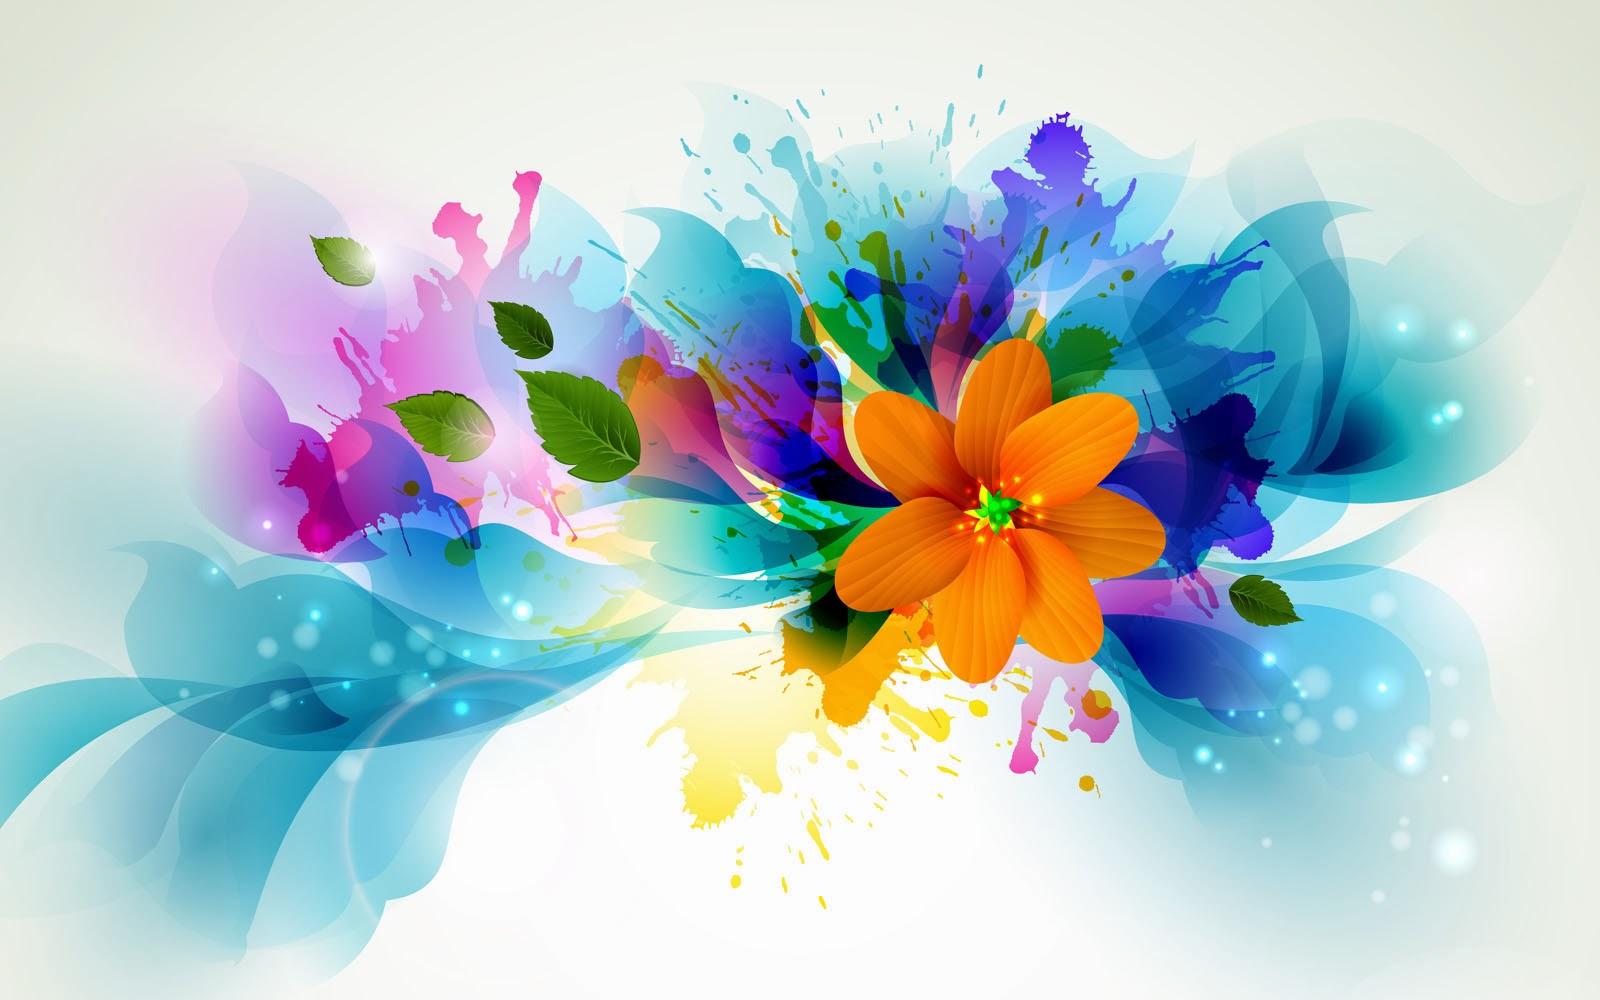 3D Flowers Wallpapers 3D Flowers Desktop Wallpapers 3D Flowers 1600x1000